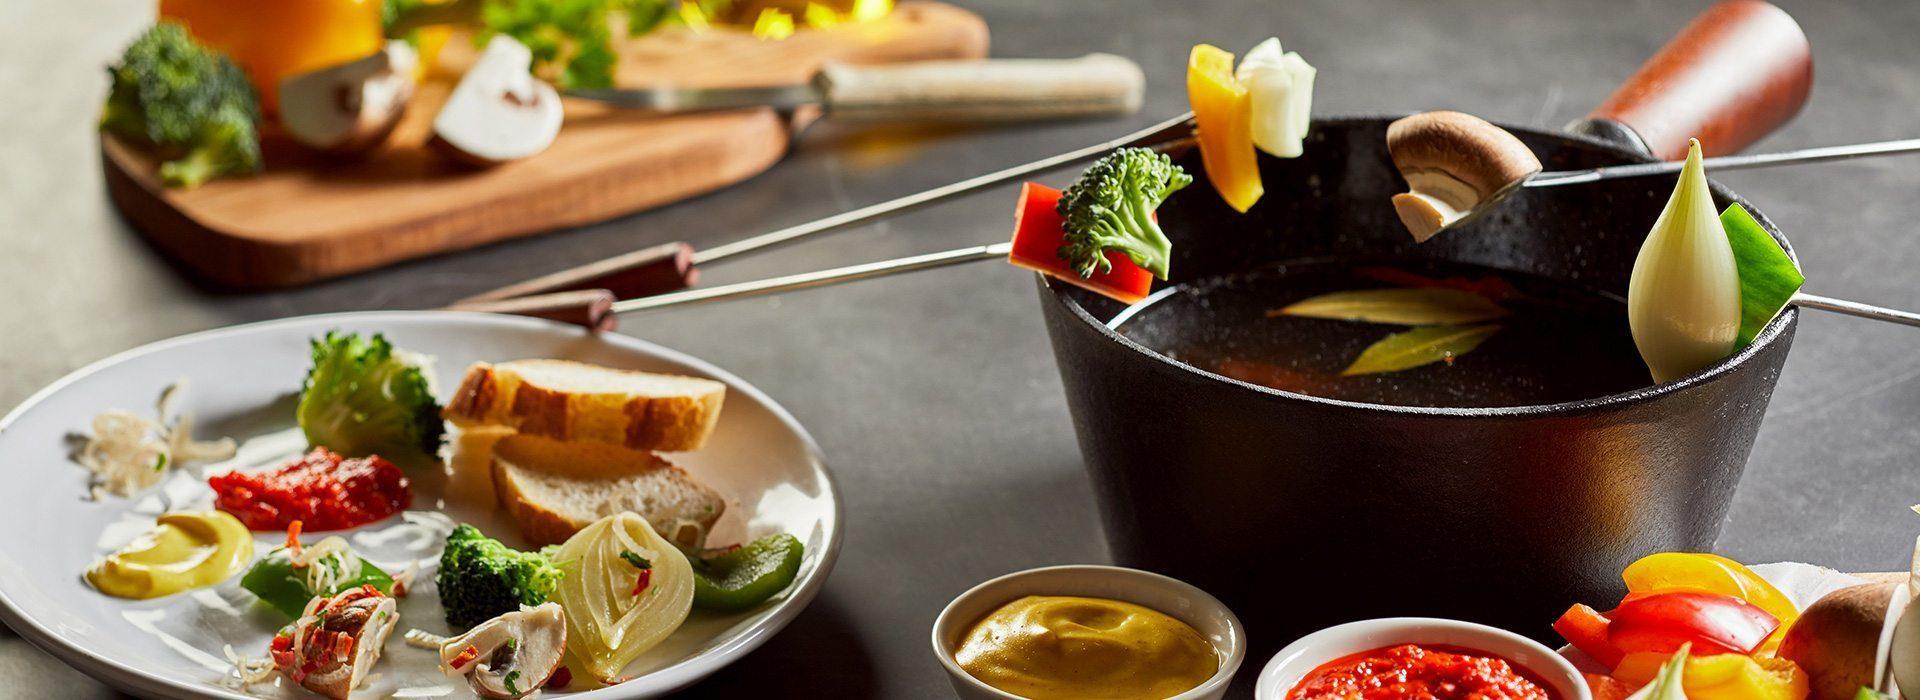 Recettes - Bouillon fondue chinoise